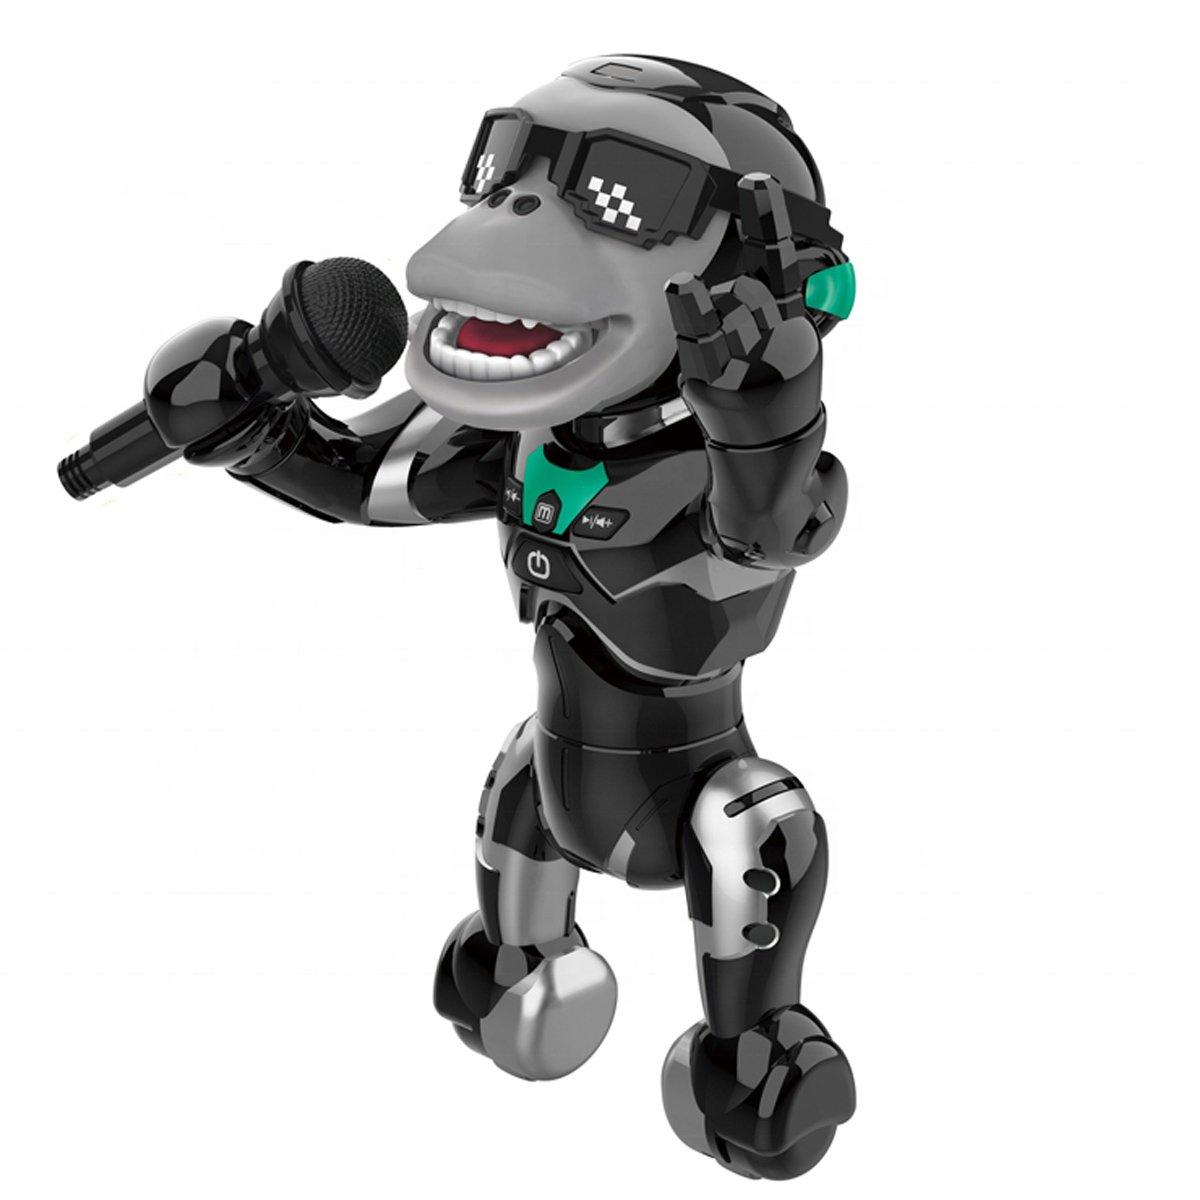 اسباب بازی طرح ربات مدل اورانگوتان کد k12